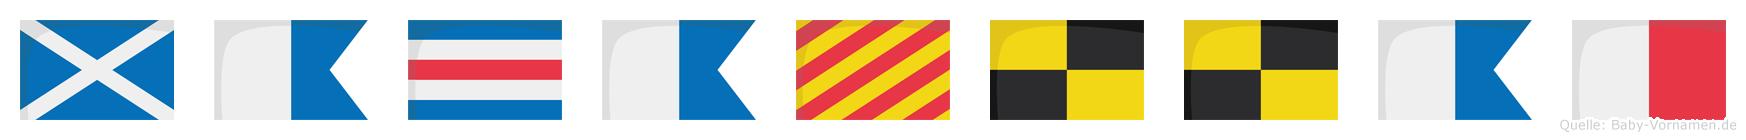 Macayllah im Flaggenalphabet